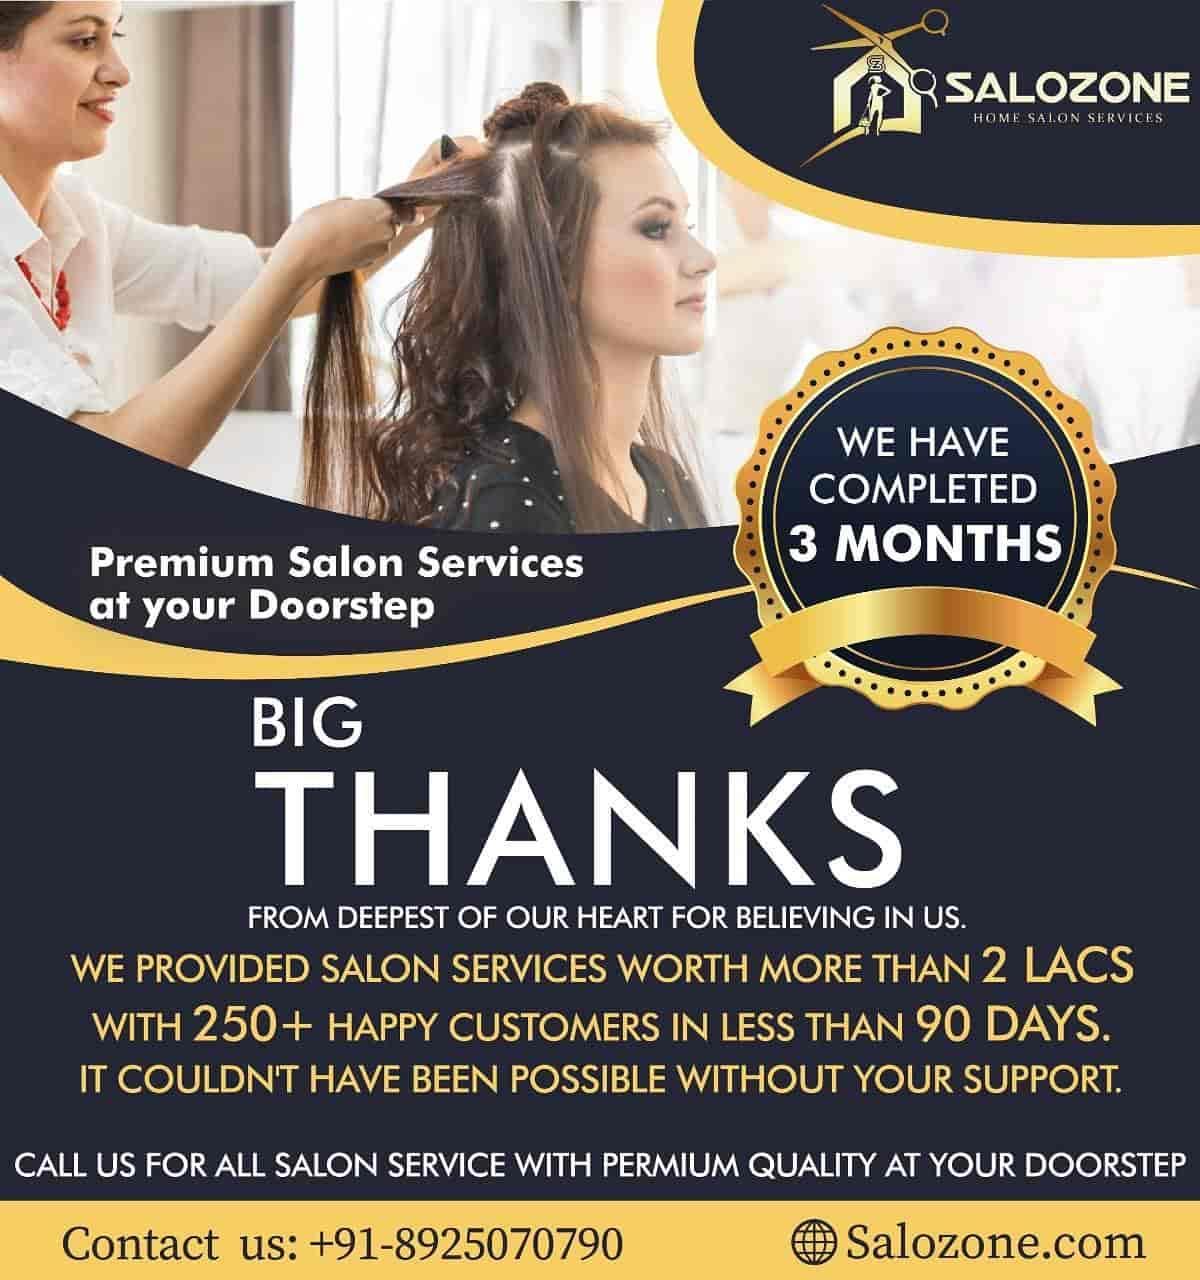 Salozone Home Salon Services, Patna Gpo - Beauty Parlours At